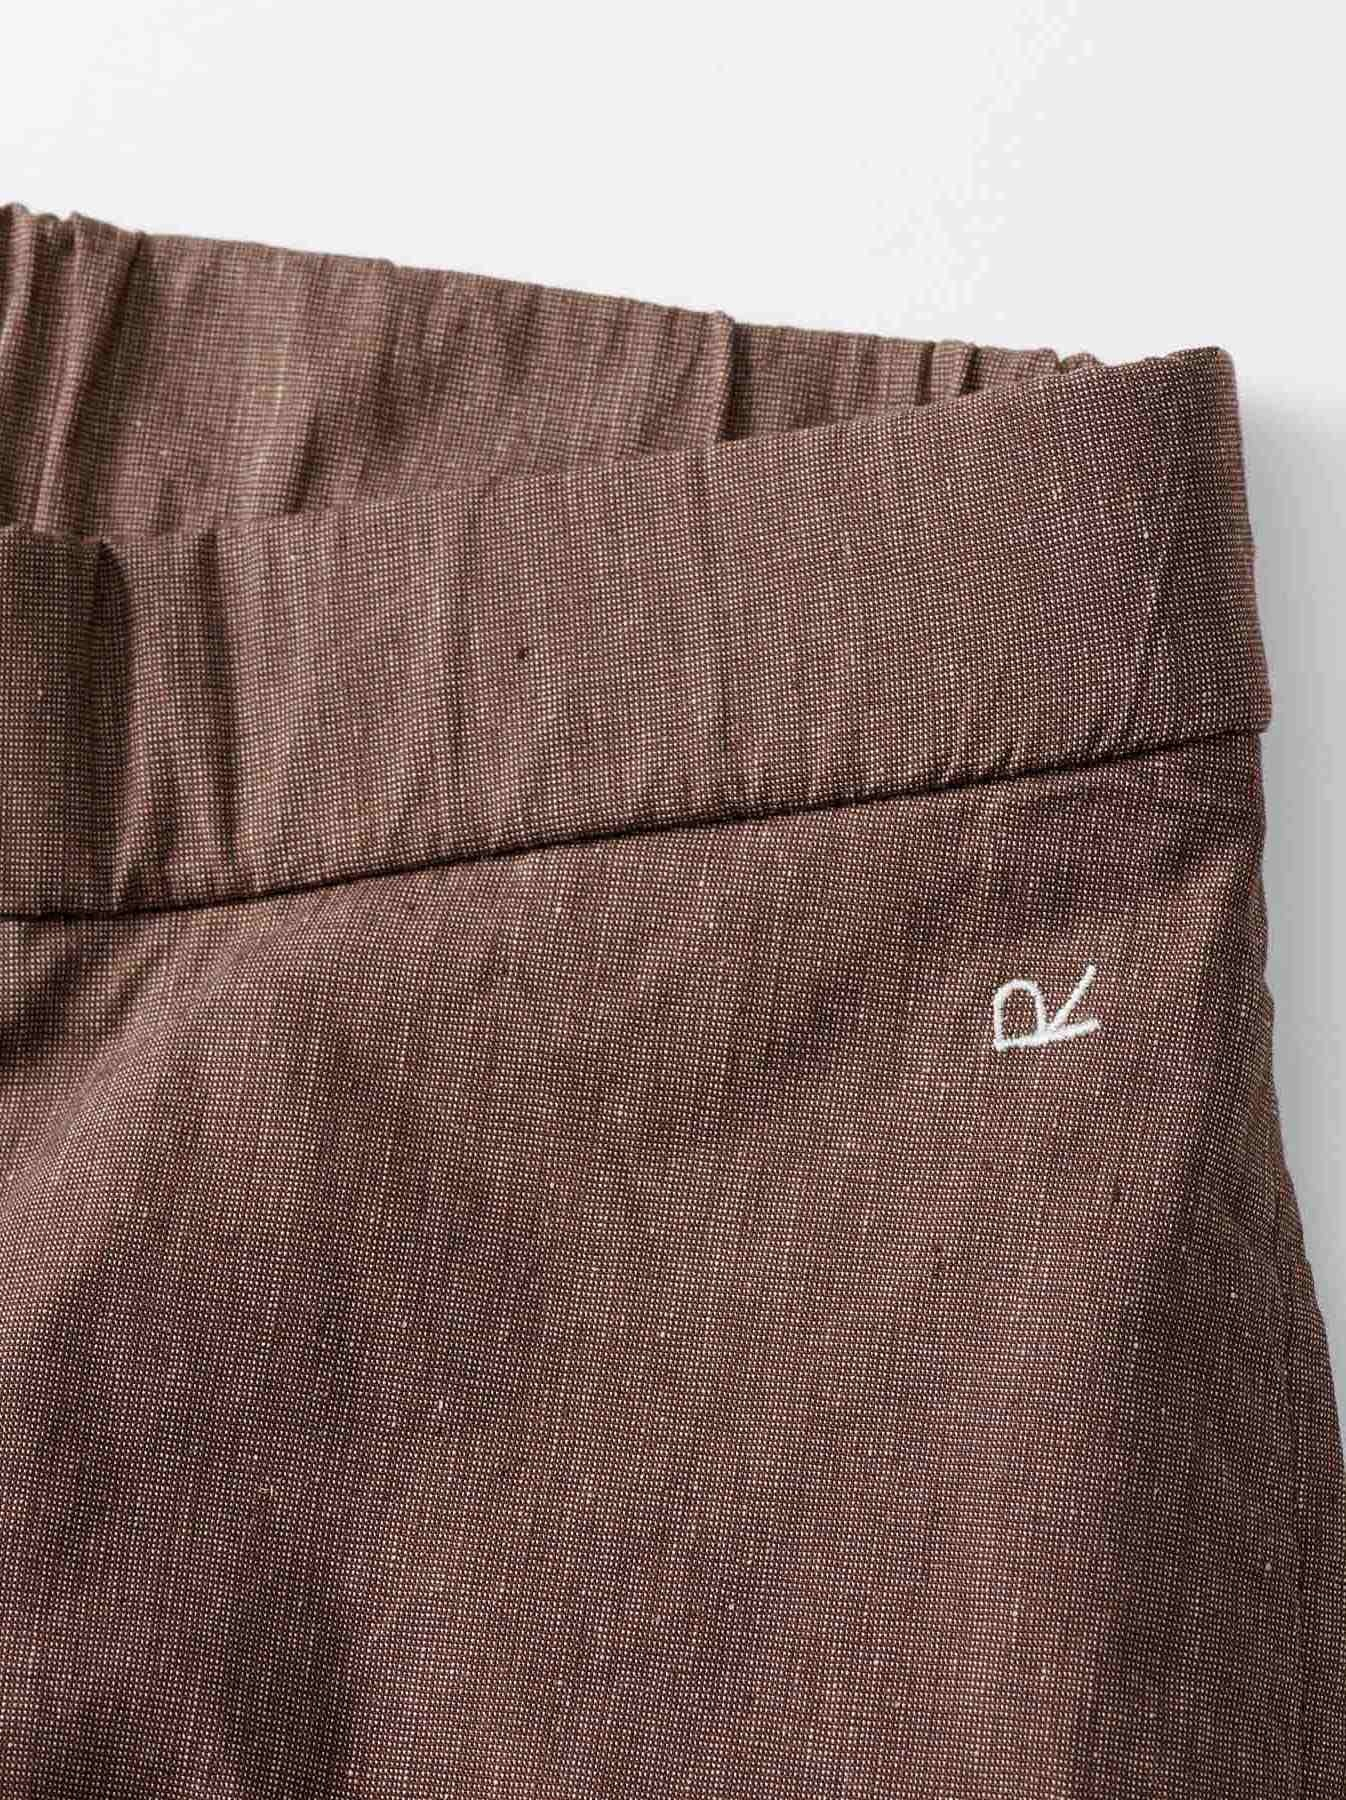 WH Cotton Linen Hakeme Stretch Pants-8